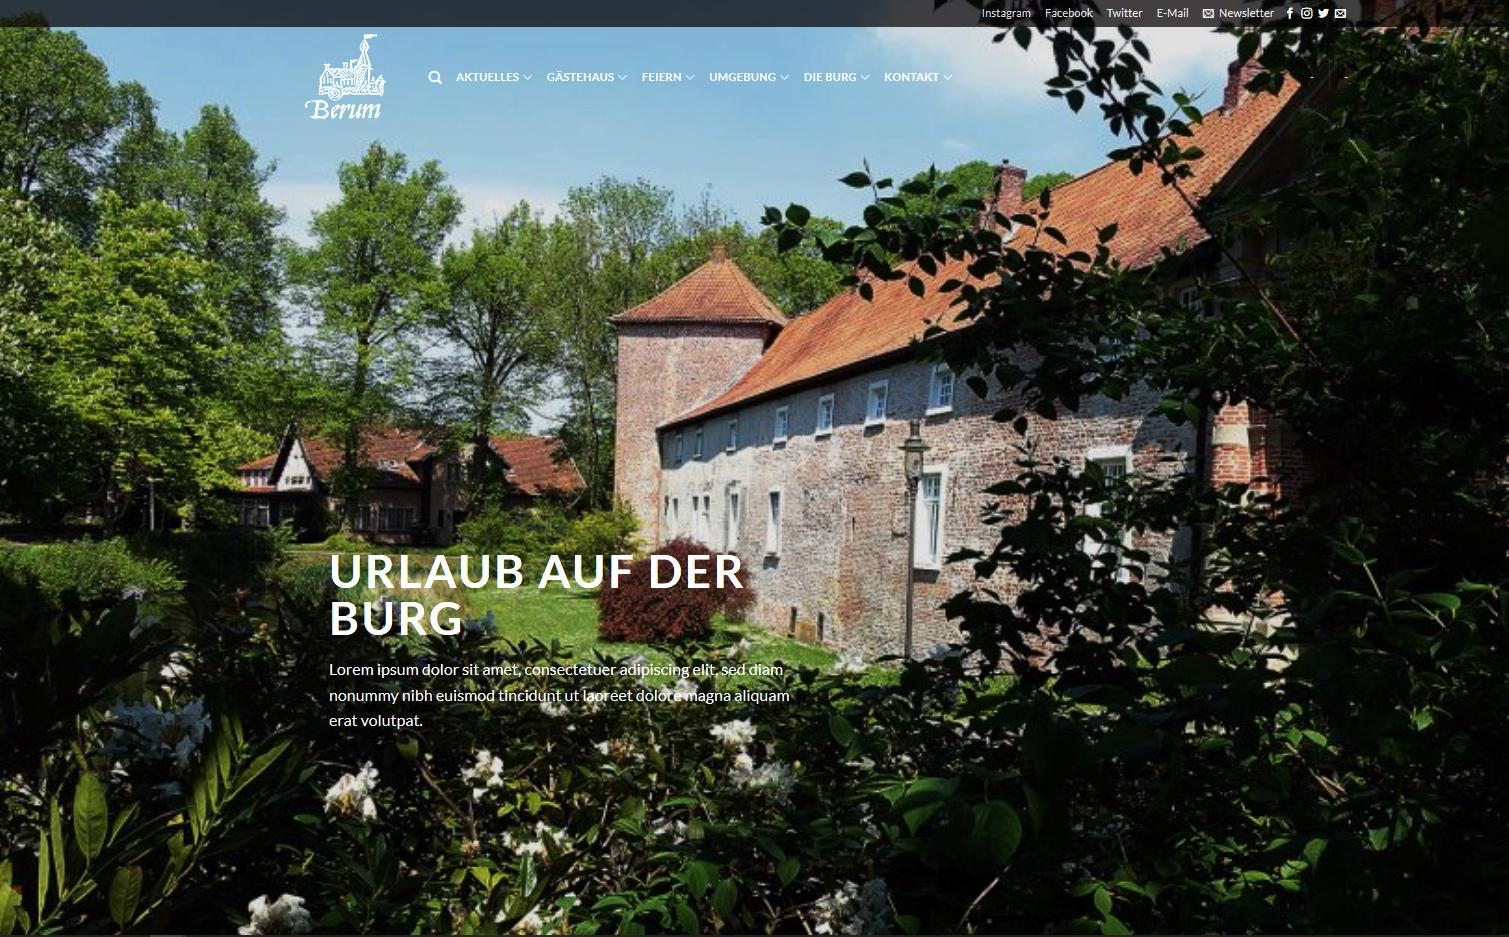 Burg Berum, WordPress, Christian Bennat, Design, Programmierung, Wartung, Berlin, Friedenau